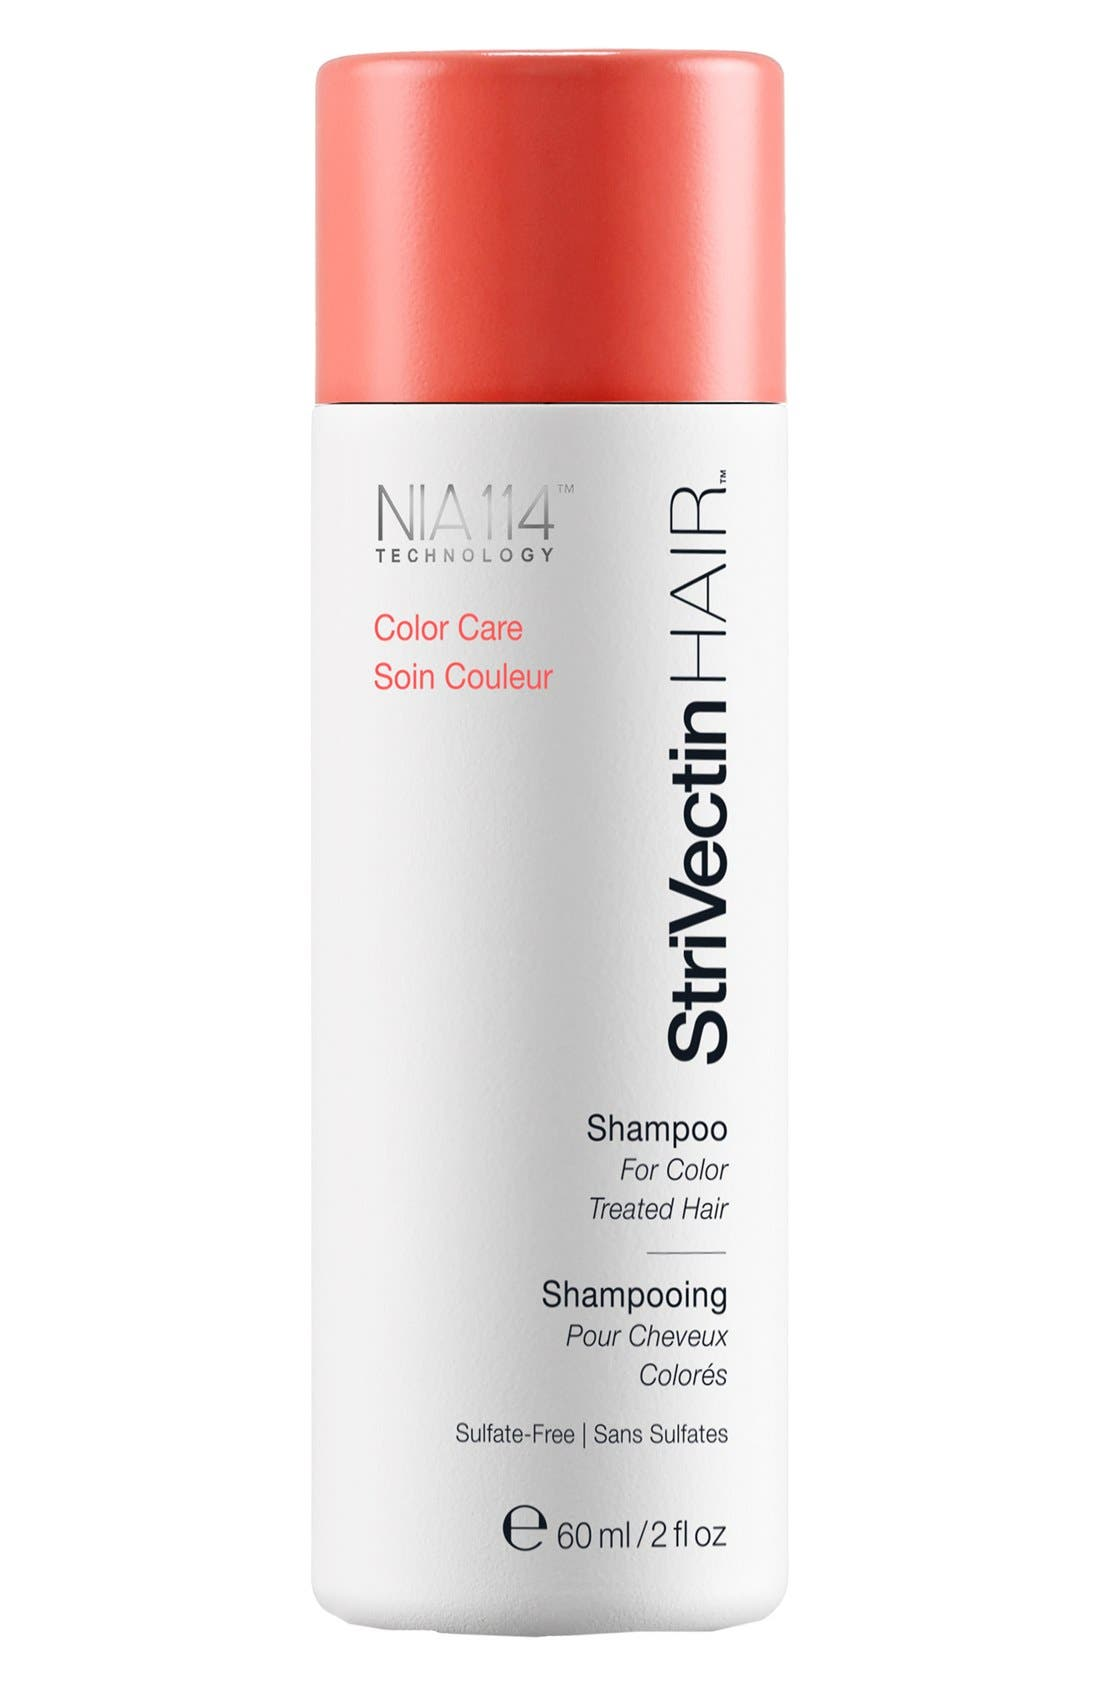 StriVectinHAIR<sup>™</sup> 'Color Care' Shampoo for Color Treated Hair,                             Main thumbnail 1, color,                             000